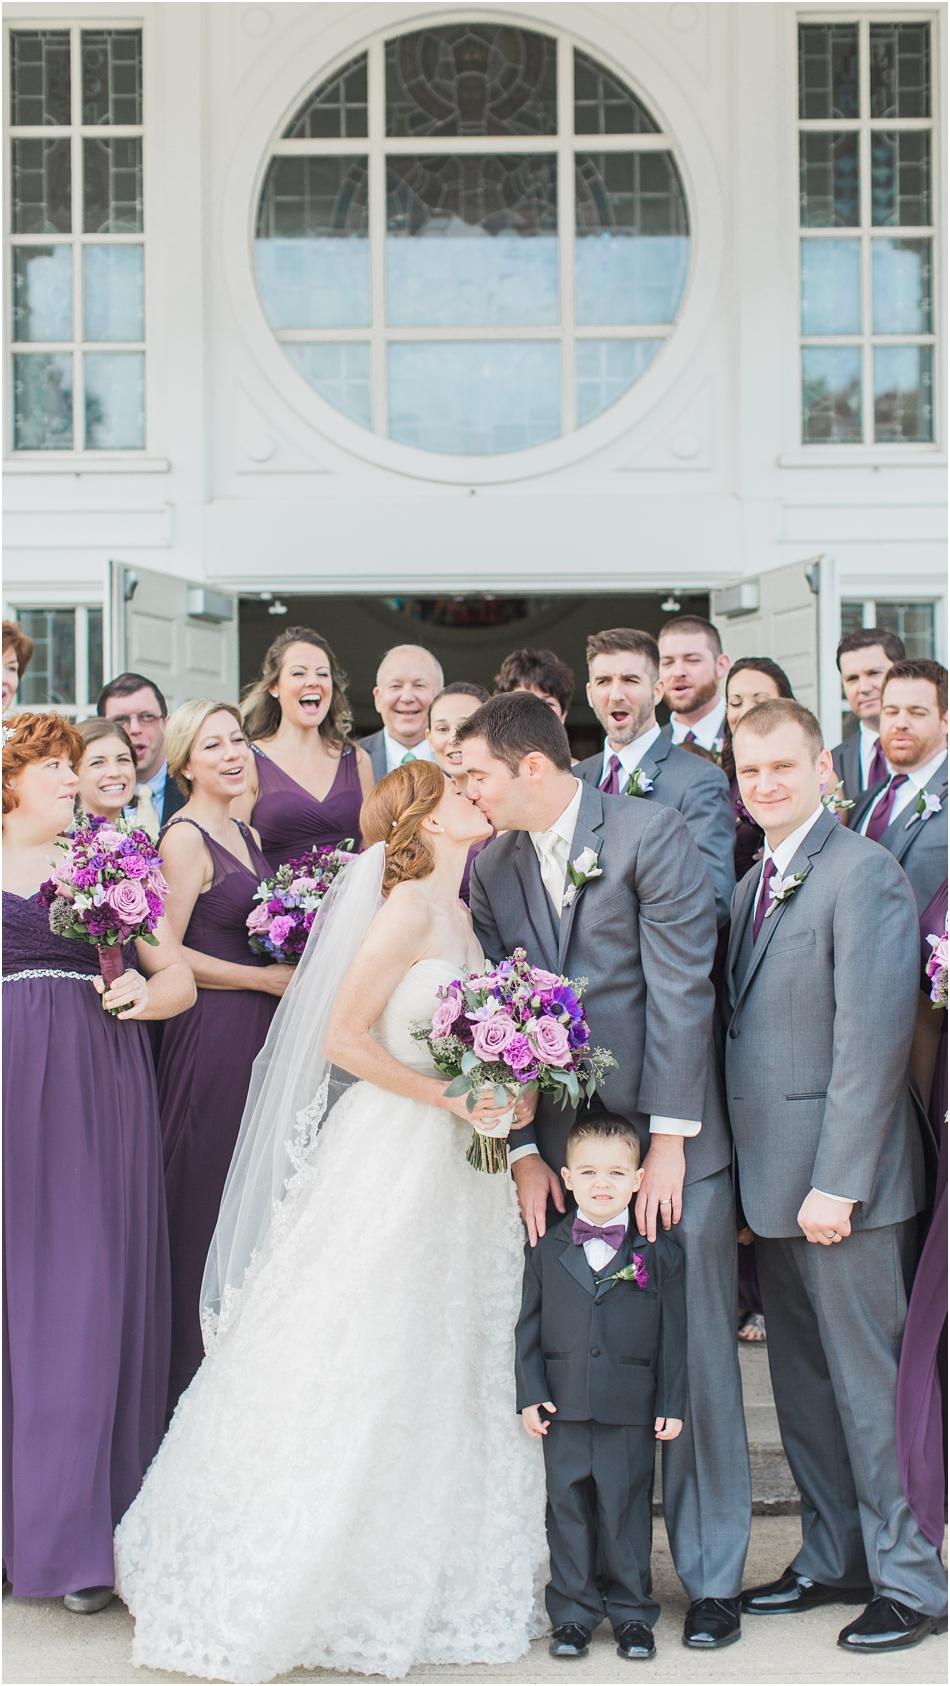 willowbend_megan_david_country_club_cape_cod_boston_new_england_wedding_photographer_Meredith_Jane_Photography_photo_0190.jpg